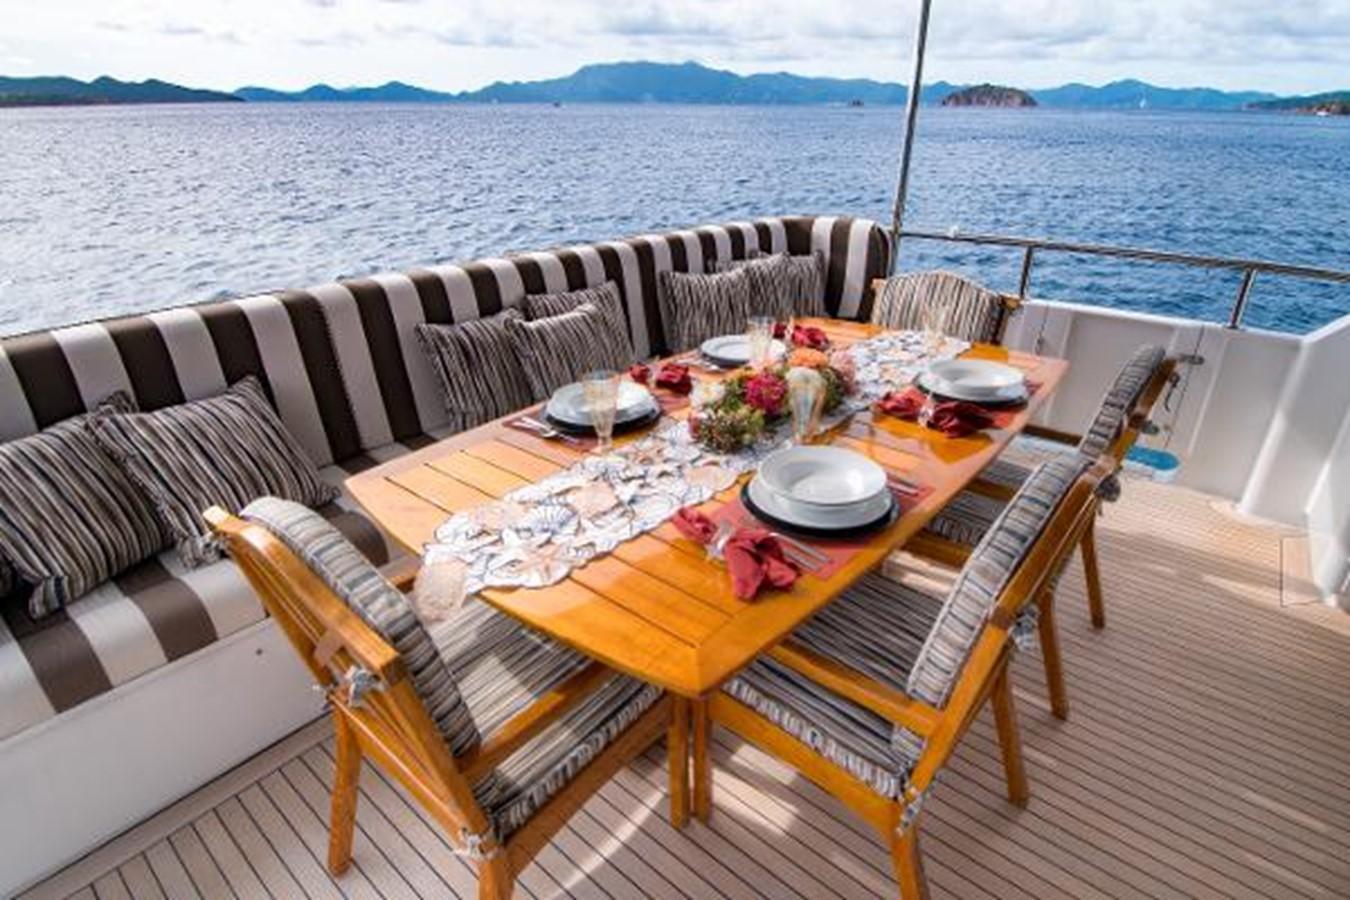 2000 BROWARD Motor Yacht Motor Yacht 2426191